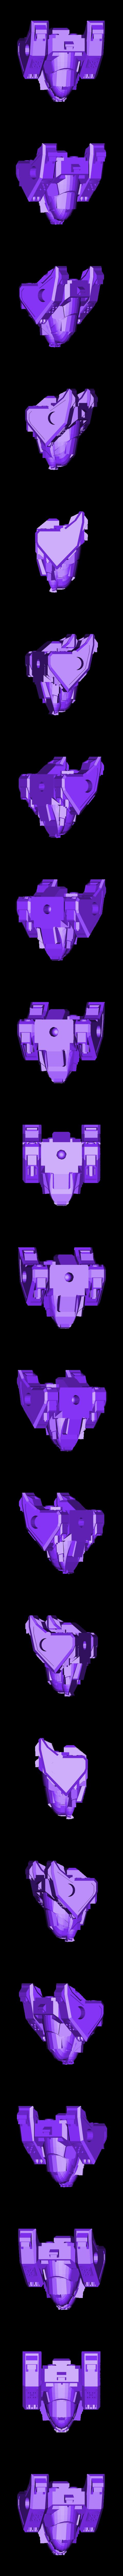 Linebacker_Head_And_Shoulders.stl Download free STL file MechWarrior Linebacker • 3D printable model, mrhers2